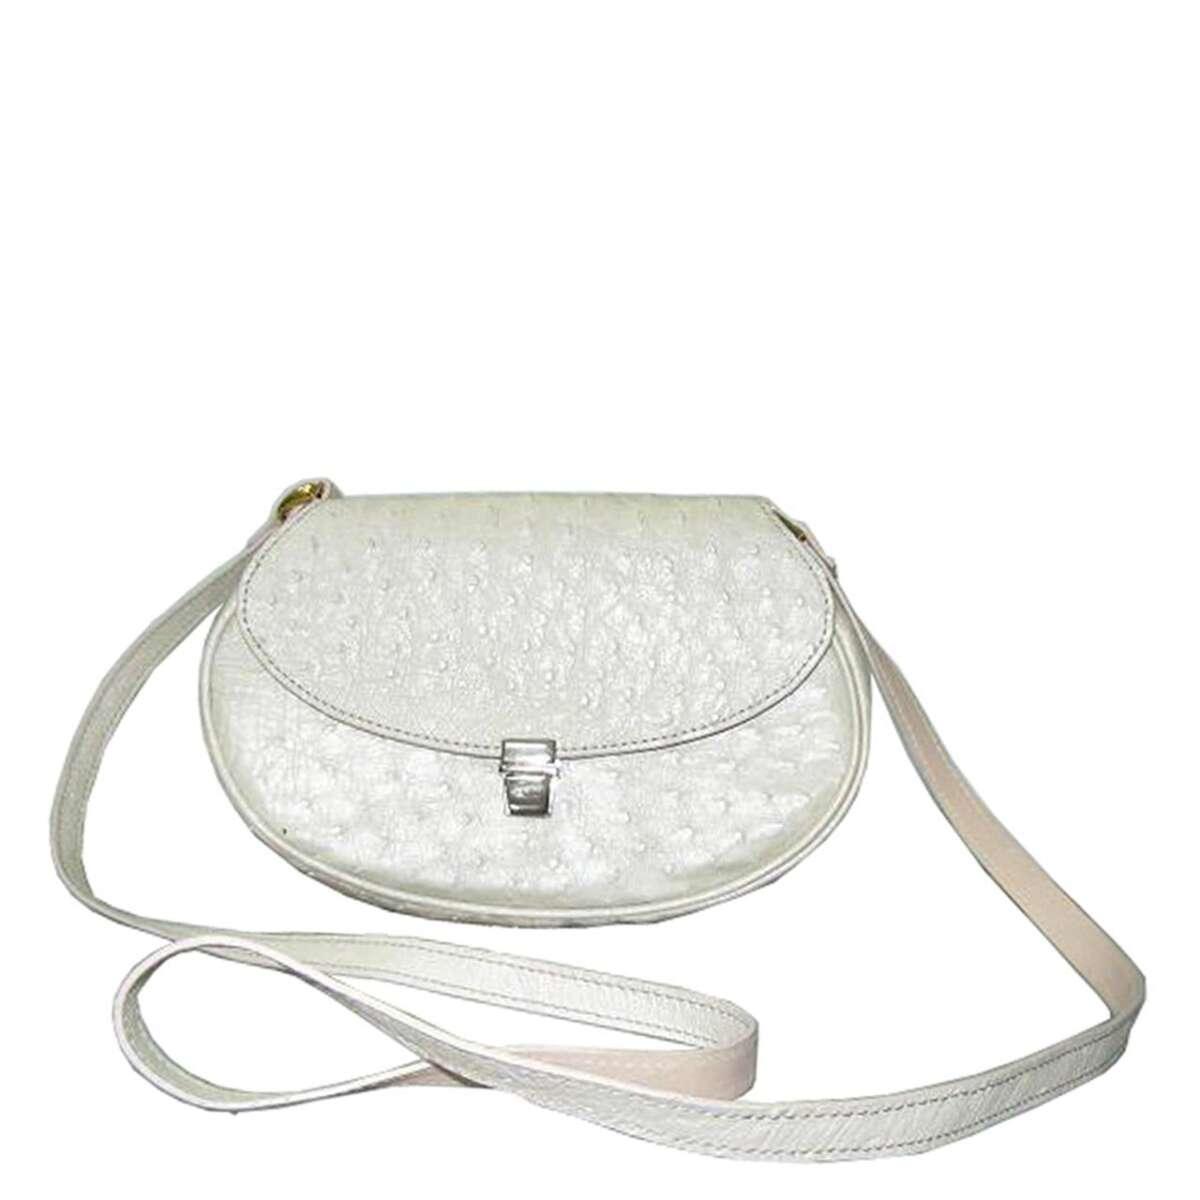 Túi đeo chéo nữ da đà điểu E121a